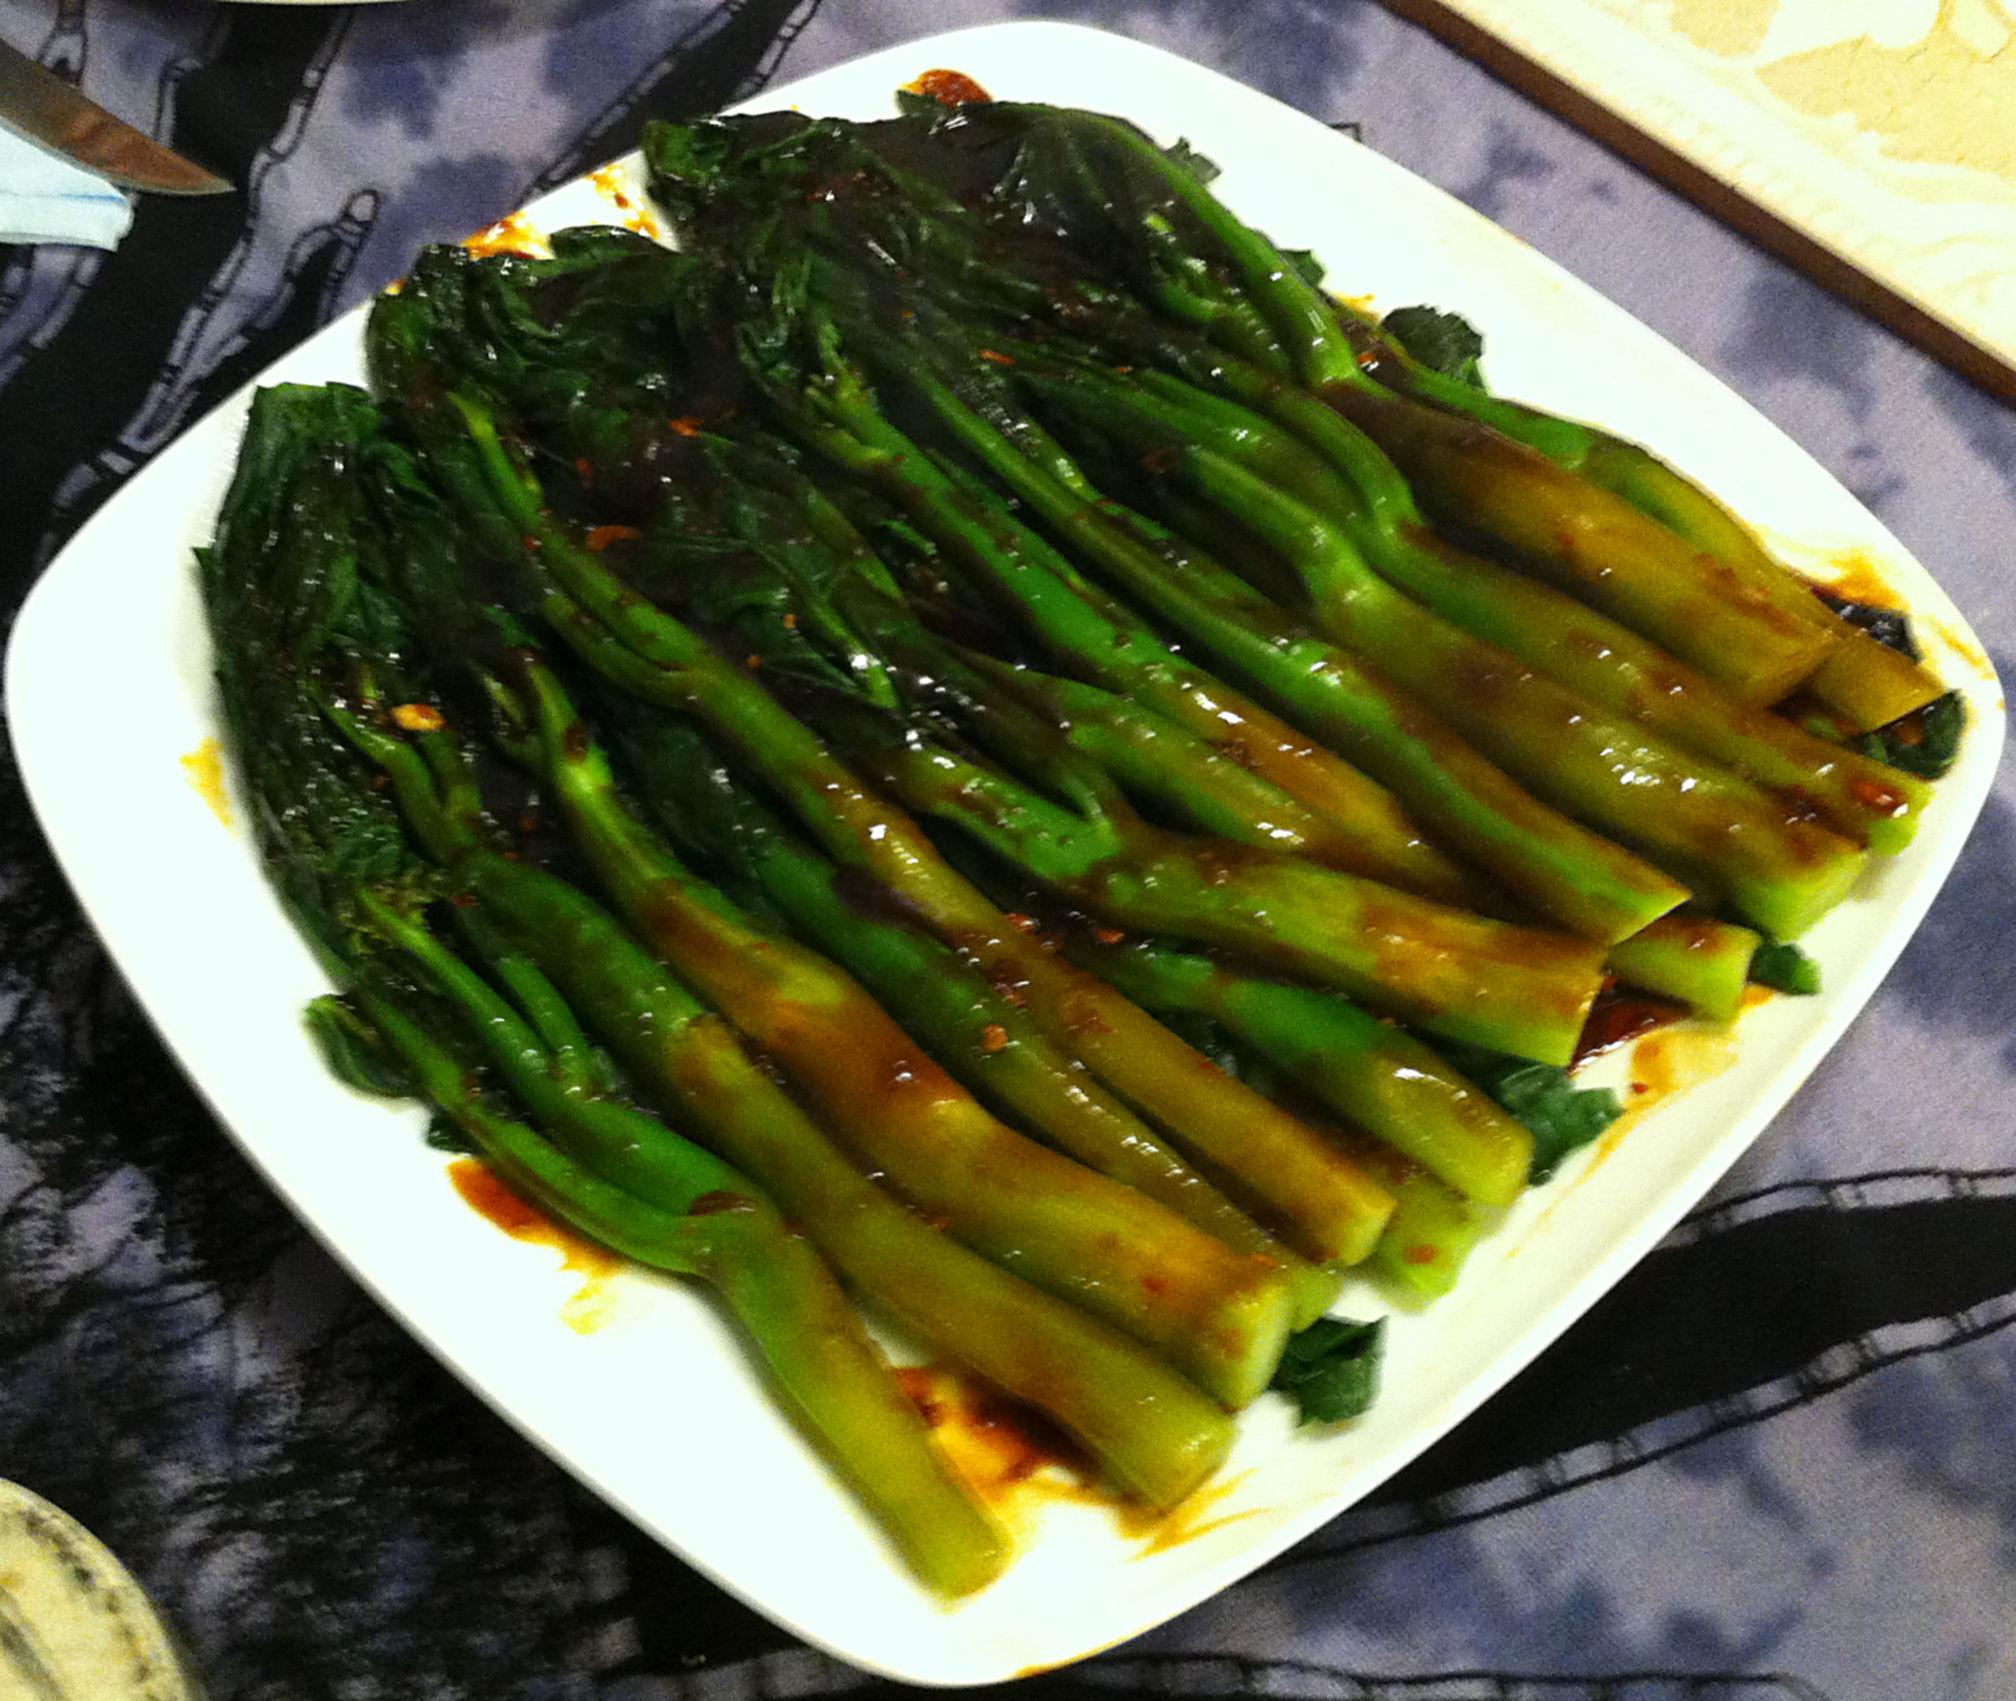 Karl S Chinese Broccoli With Mushroom Sauce Jabberwocky Stew